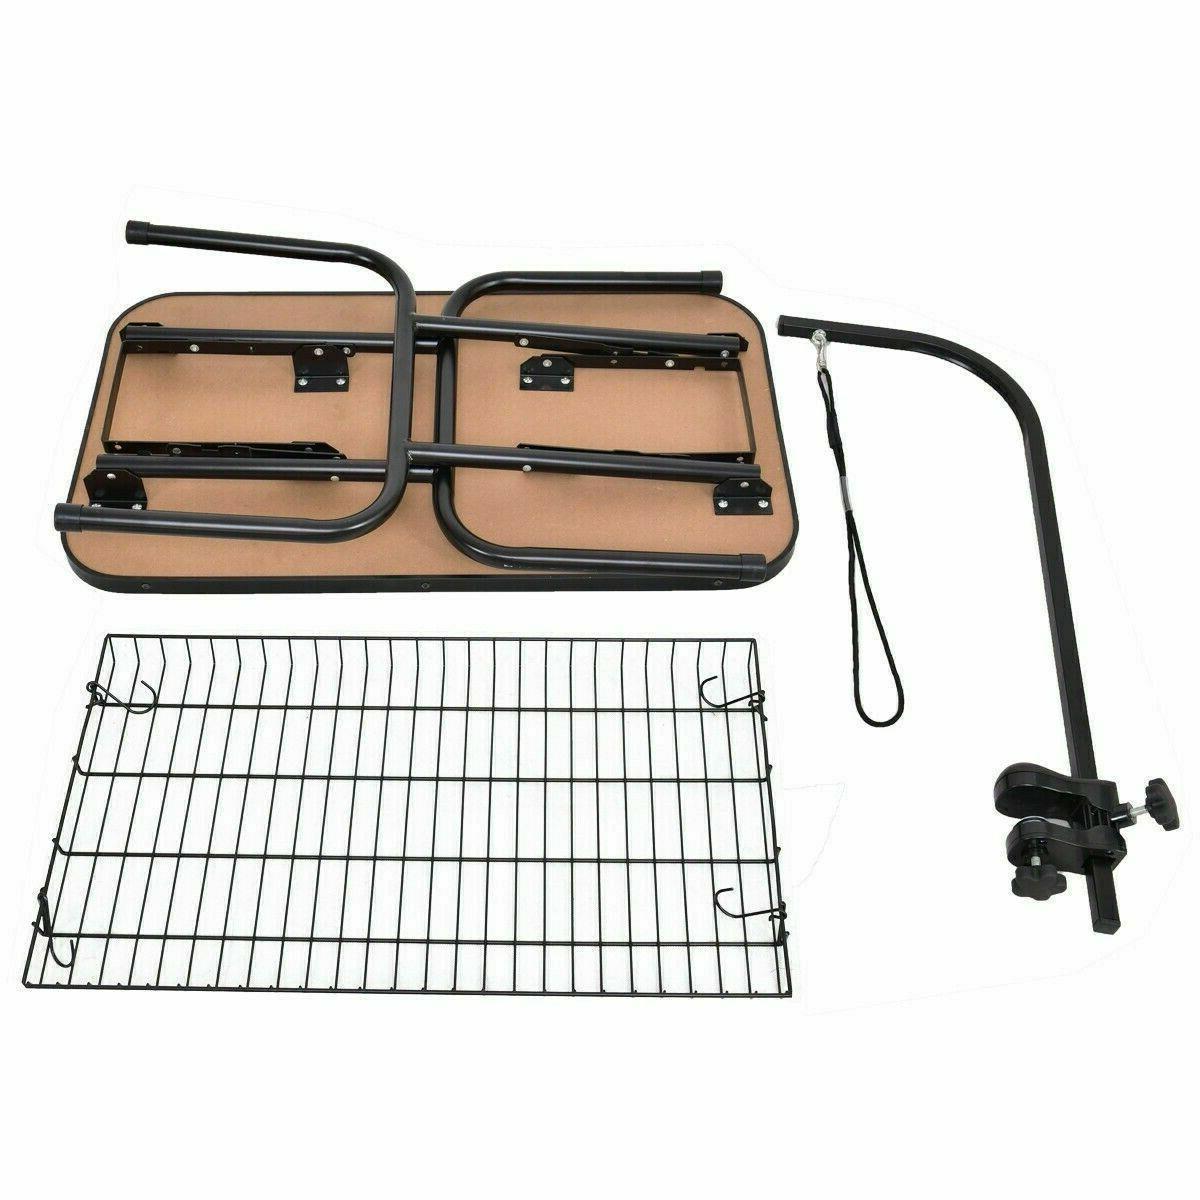 "Giantex 32"" Table Foldable Top"